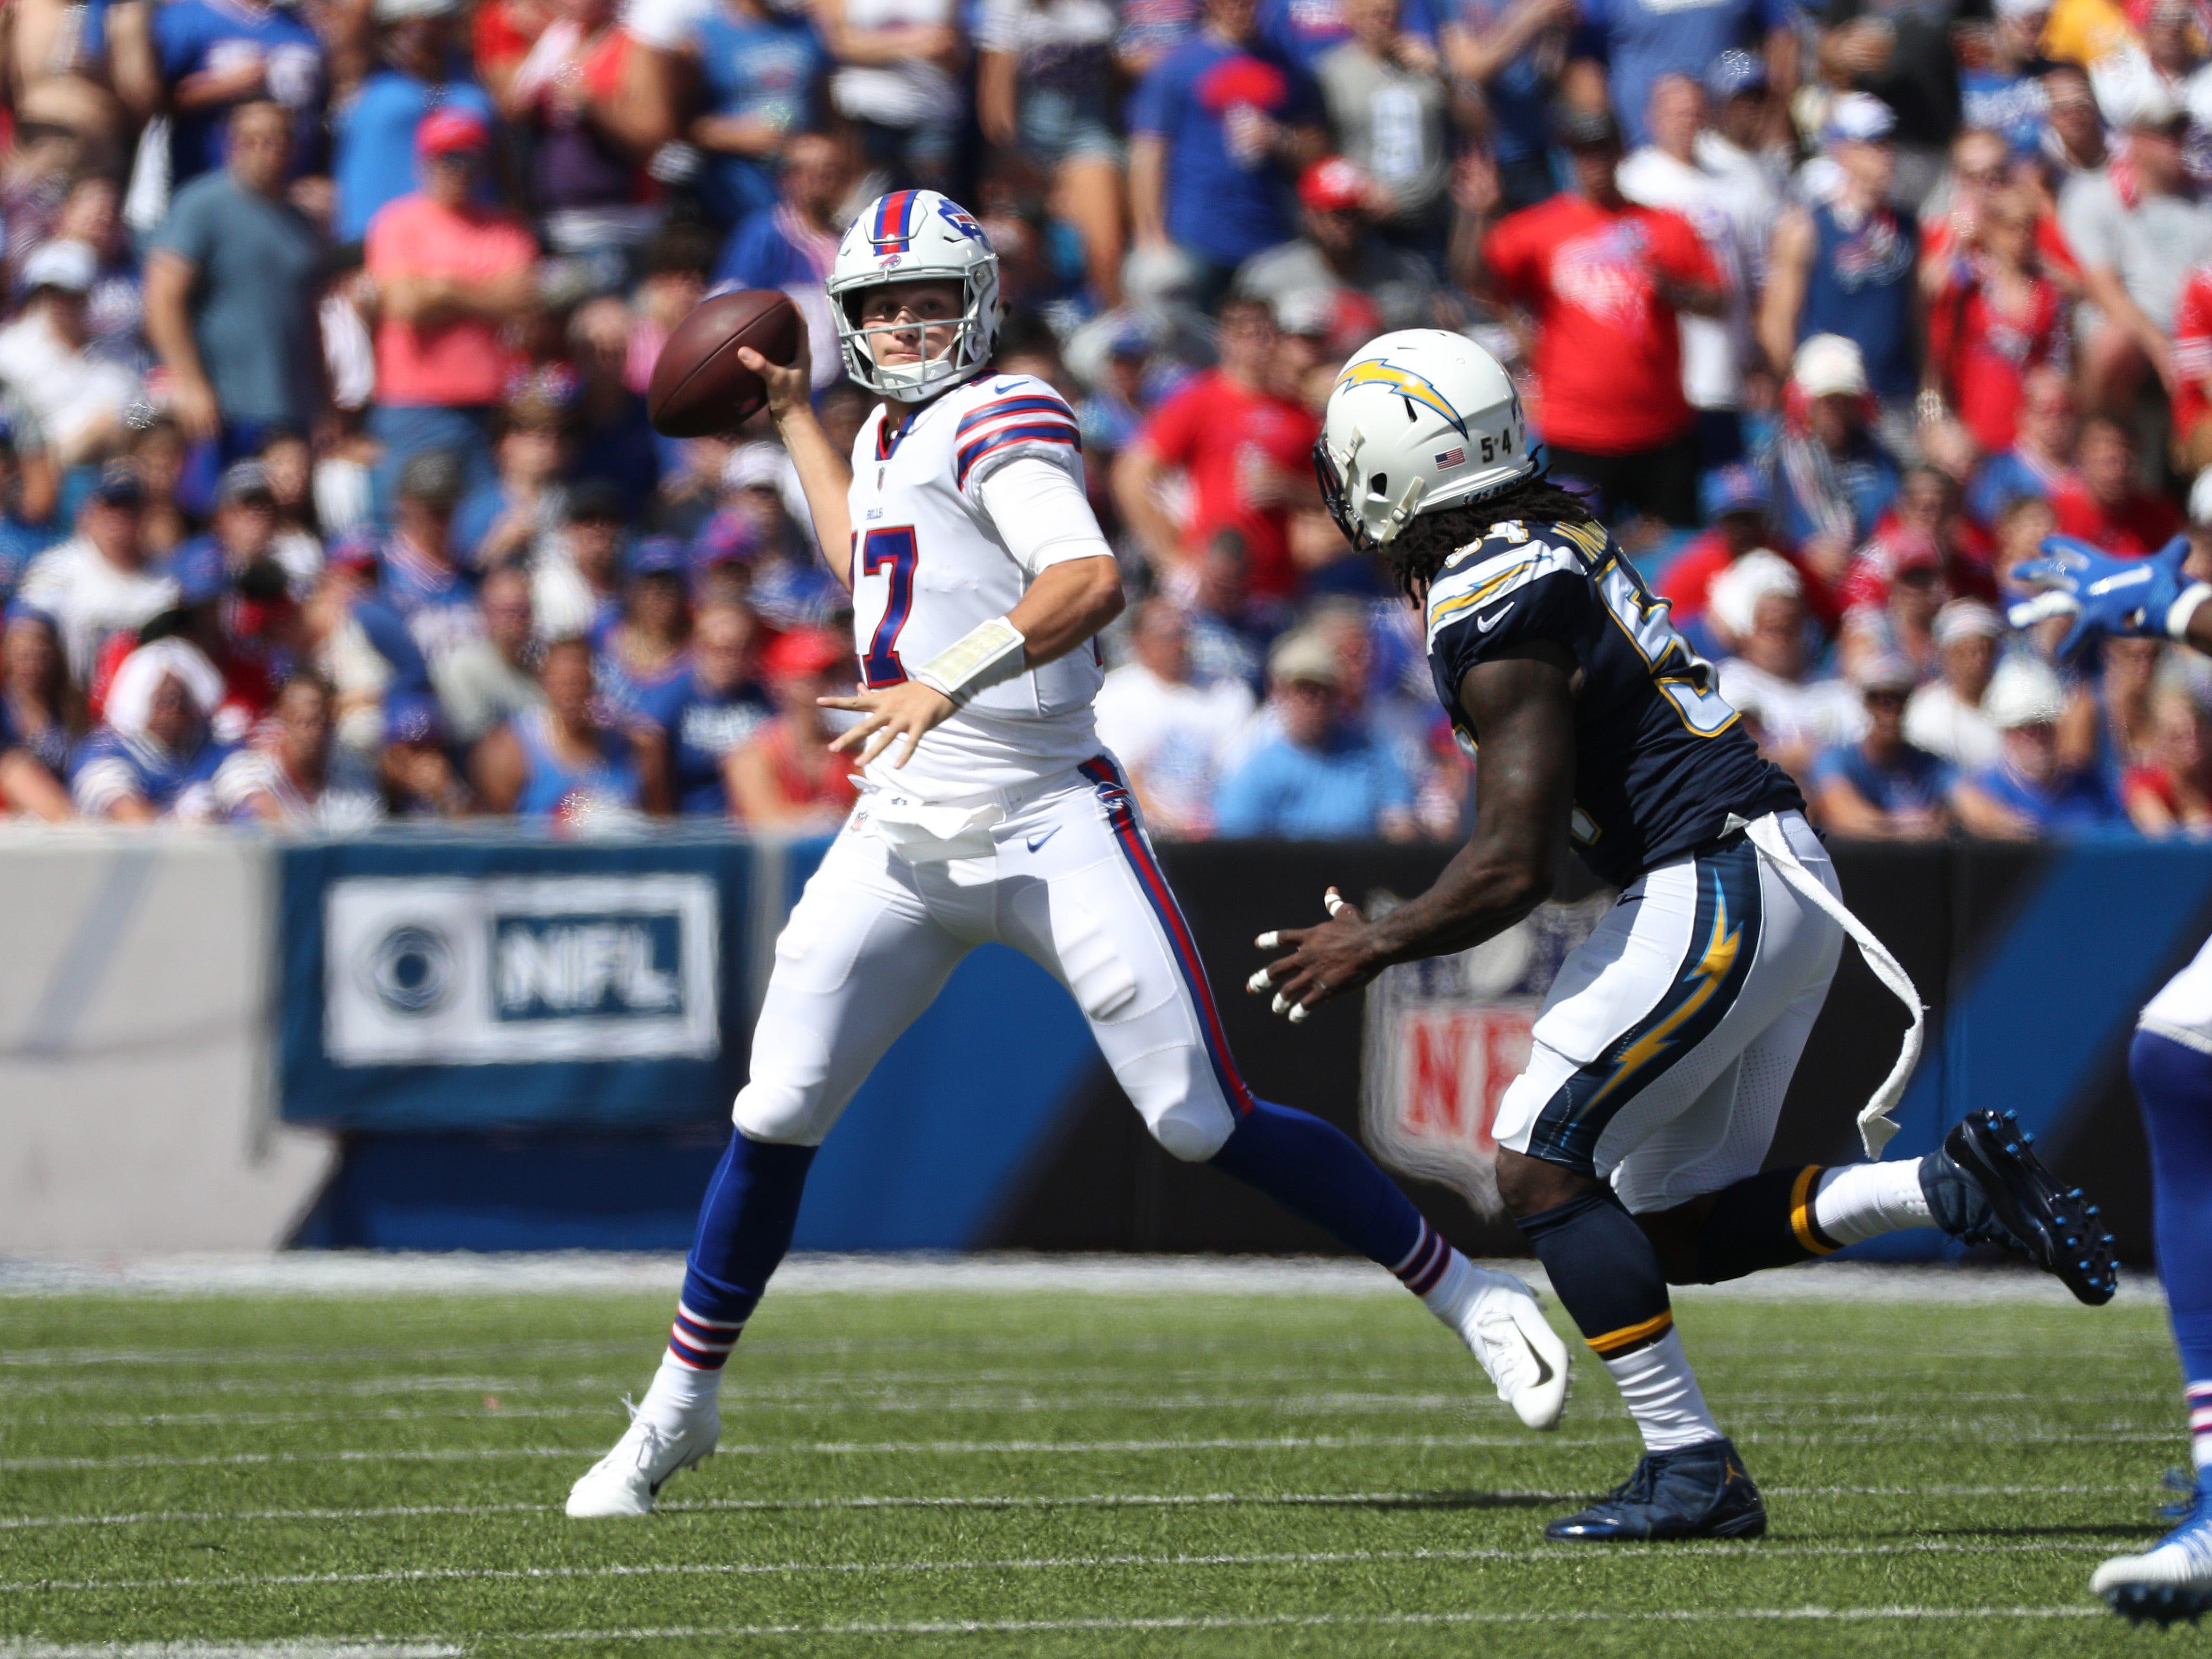 Bills quarterback Josh Allen rolls out of the pocket to throw a pass.